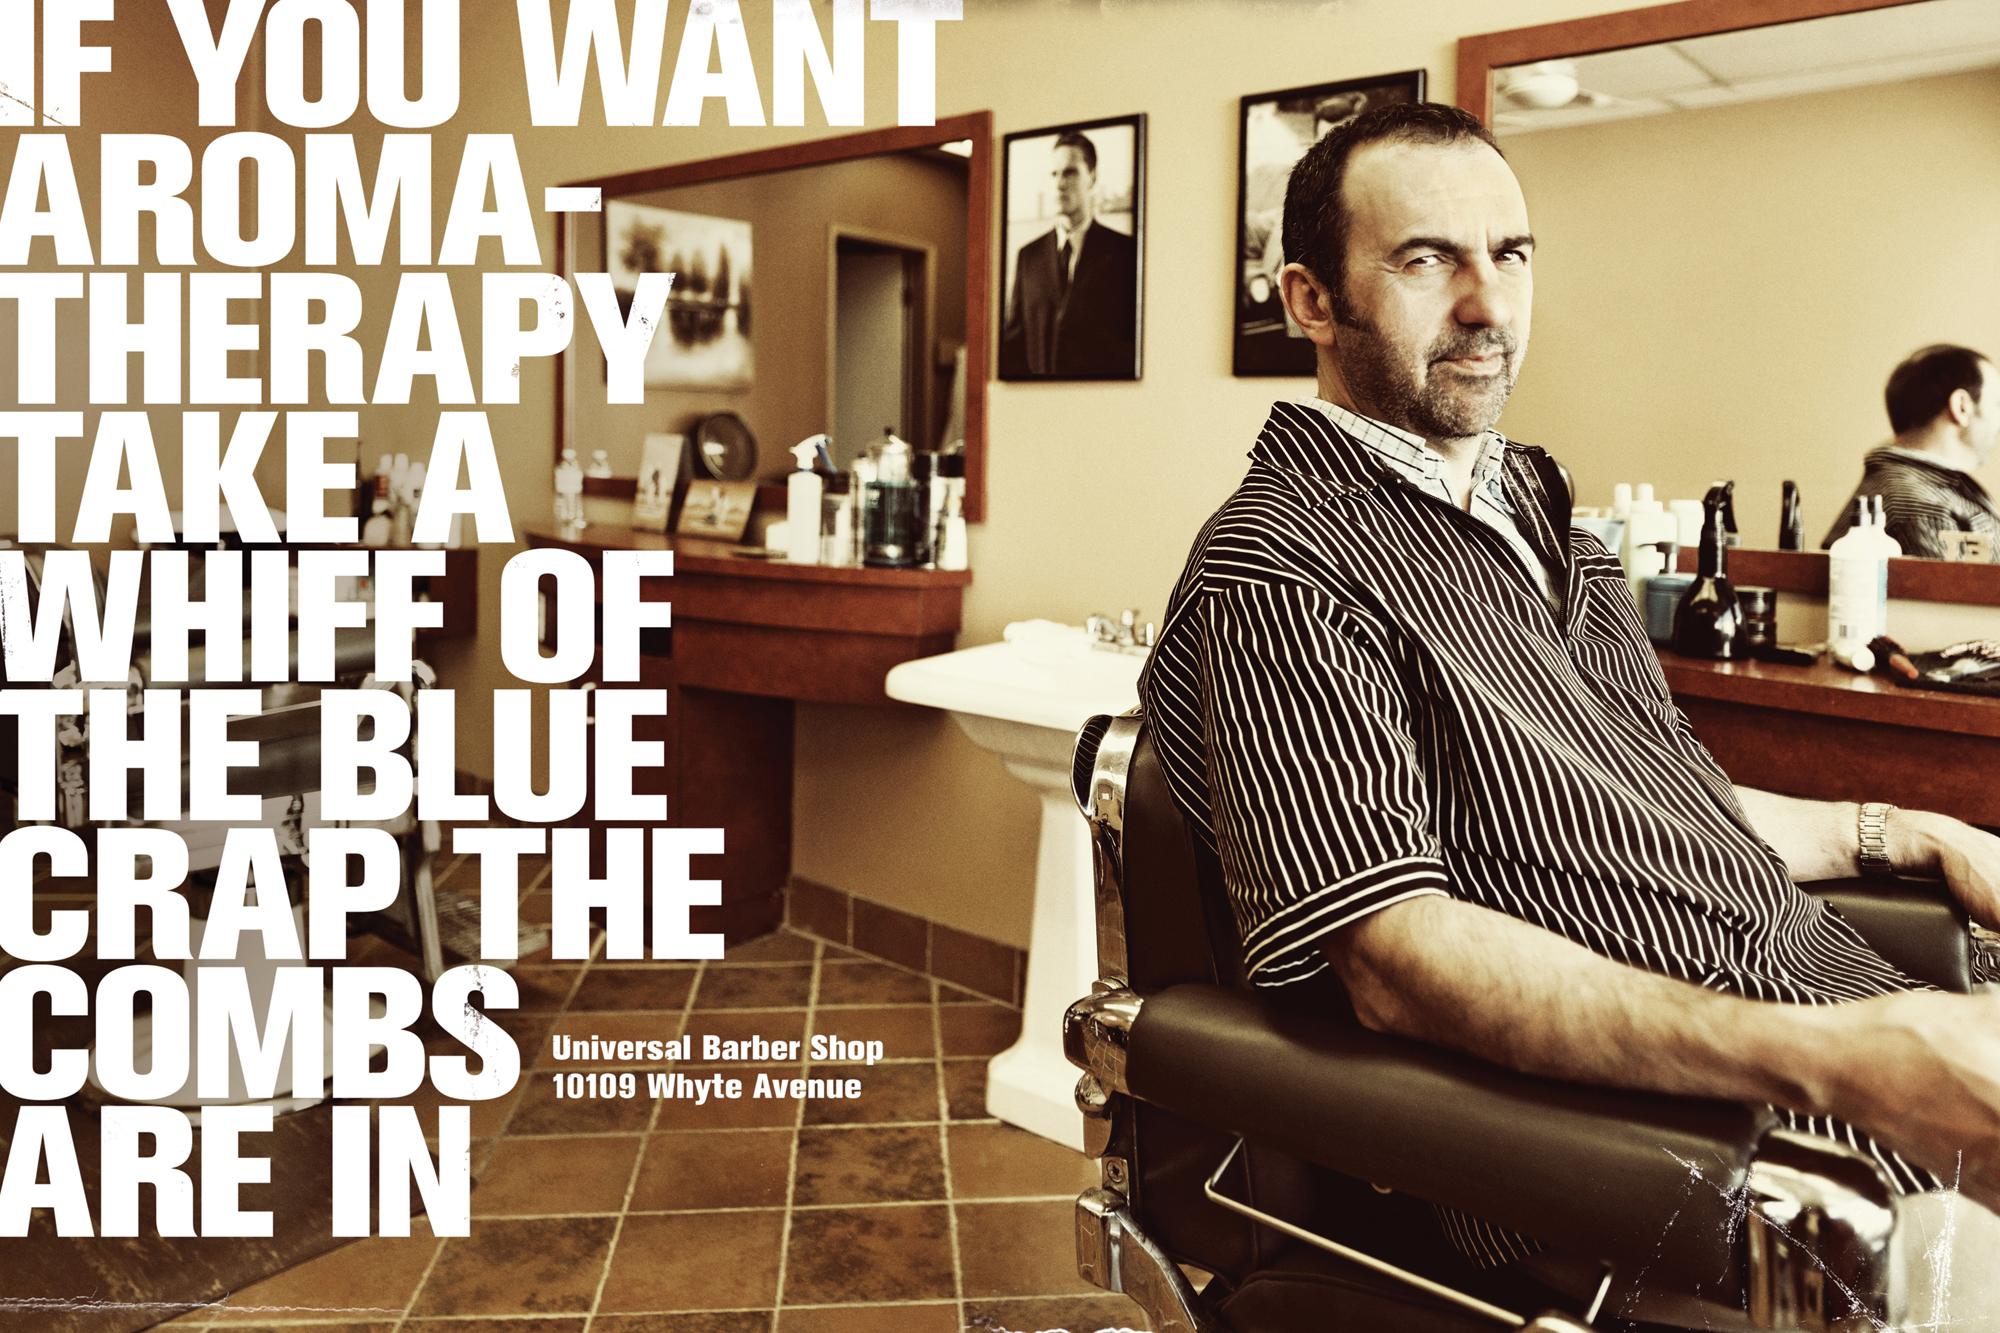 Barber Pics : Print ad: Universal Barber Shop: Aromatherapy